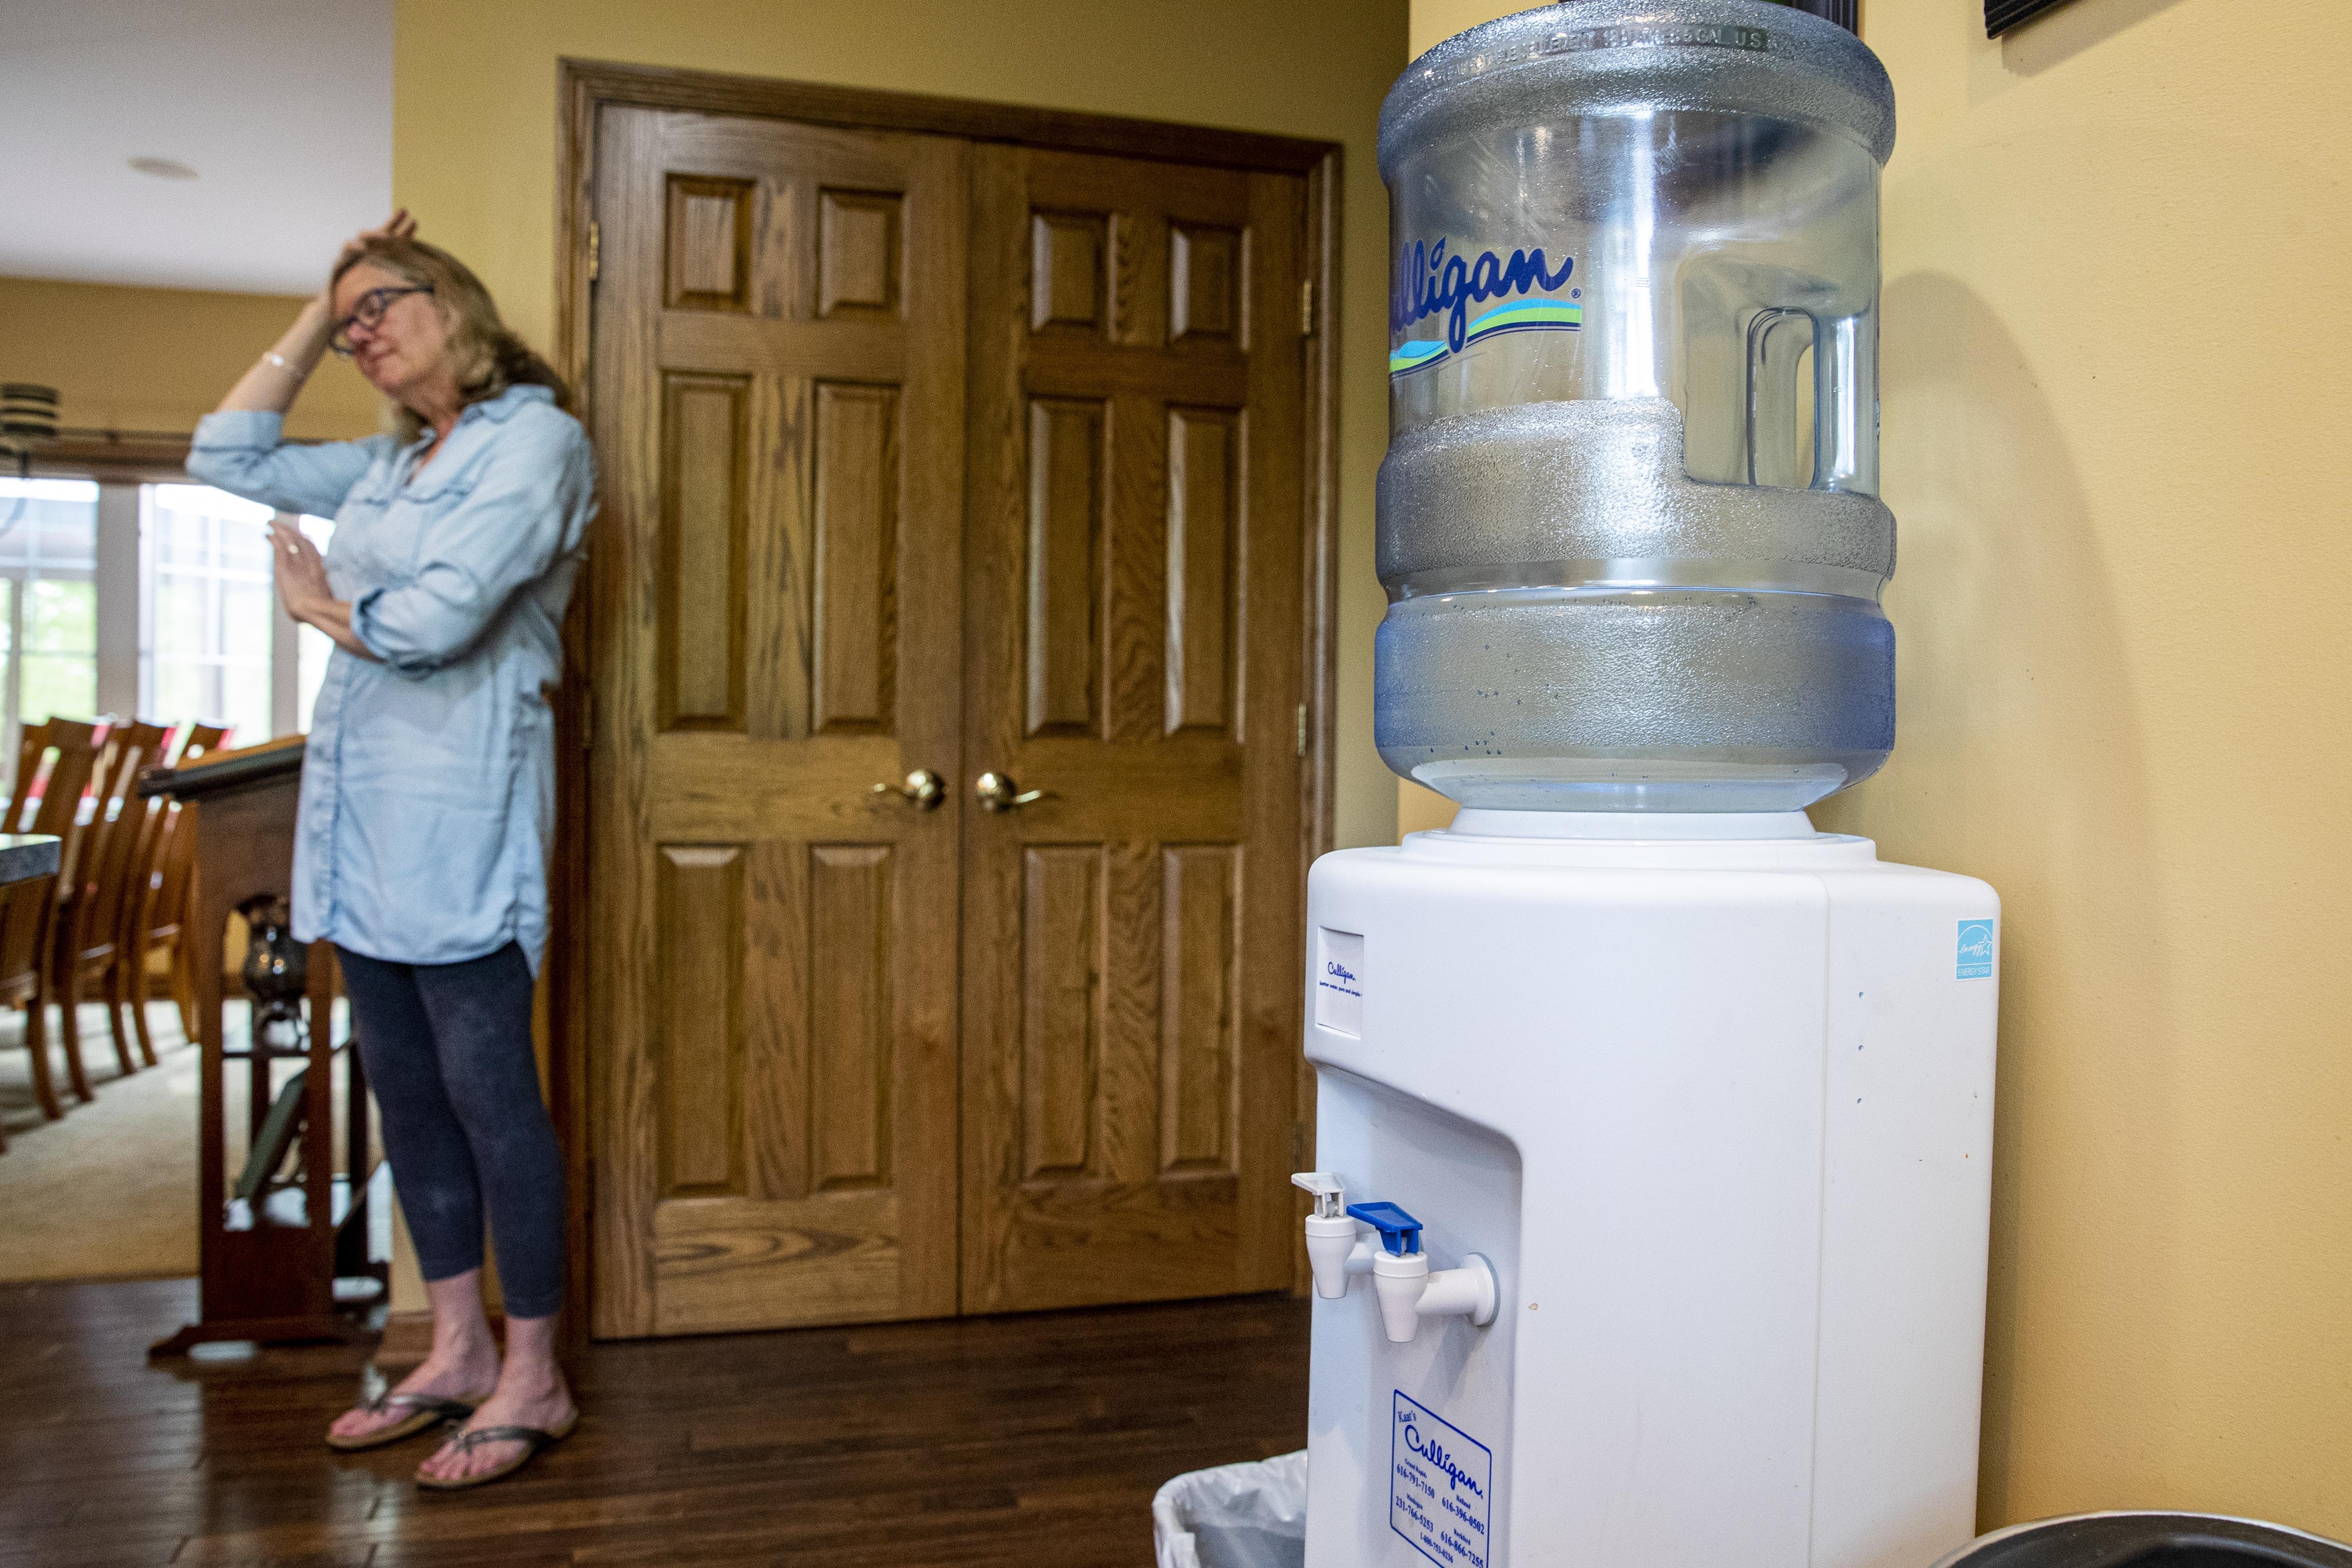 Federal PFAS hearing to focus on 'widespread industrial contamination'